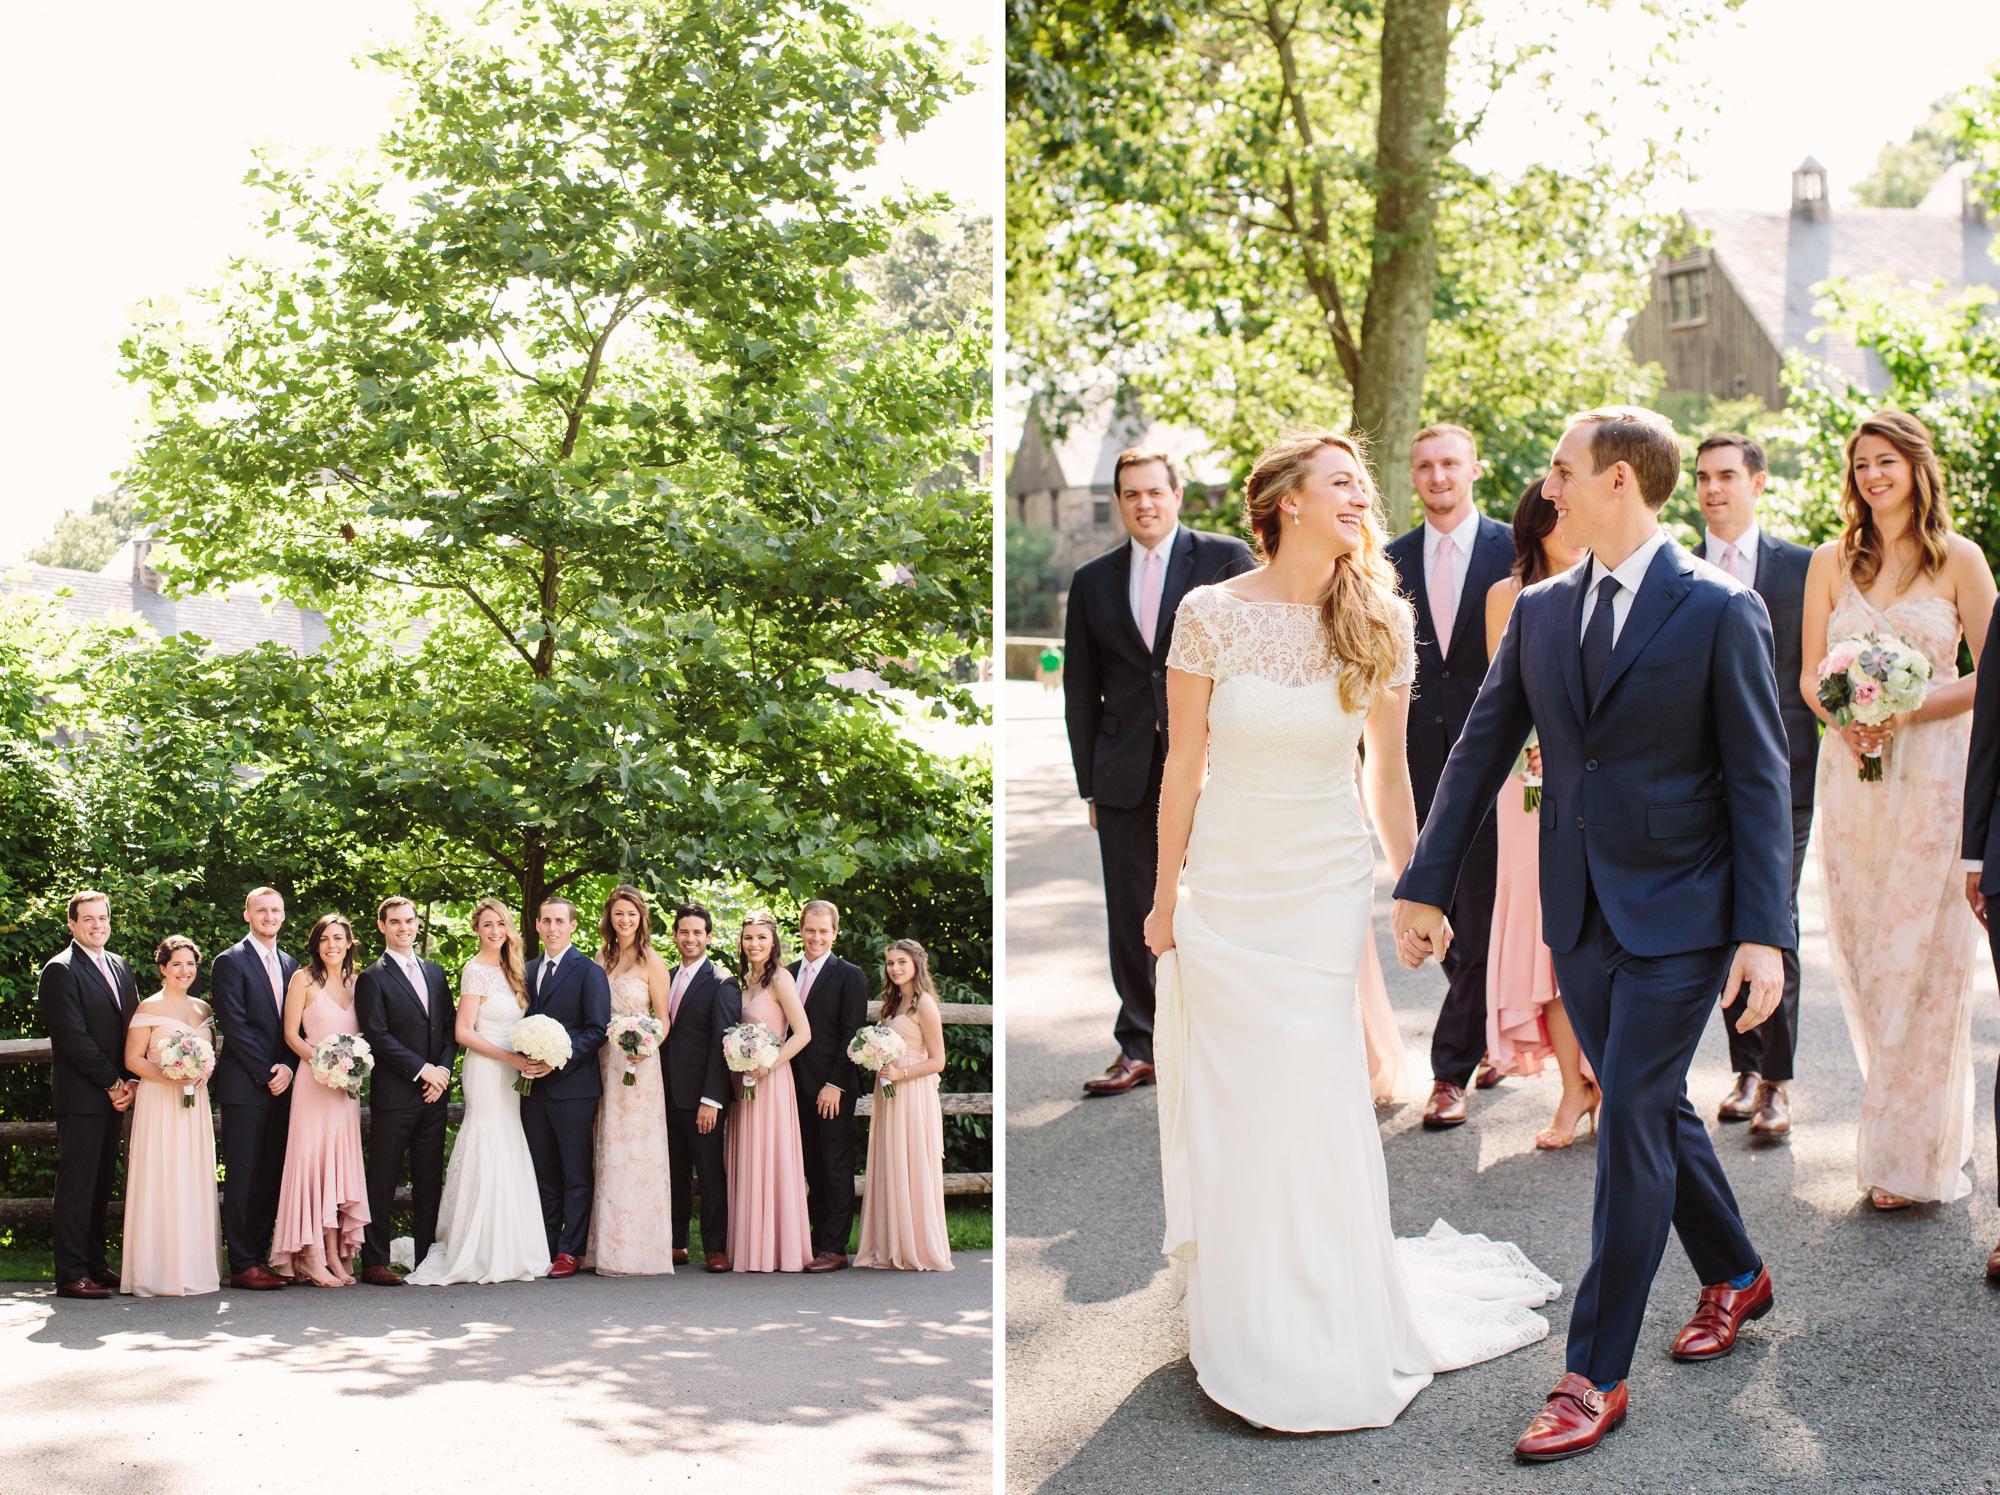 27_Jessica_Ted_Blue_Hill_Stone_Barns_Wedding_Pocantico_NY_Tanya_Salazar_Photography.jpg